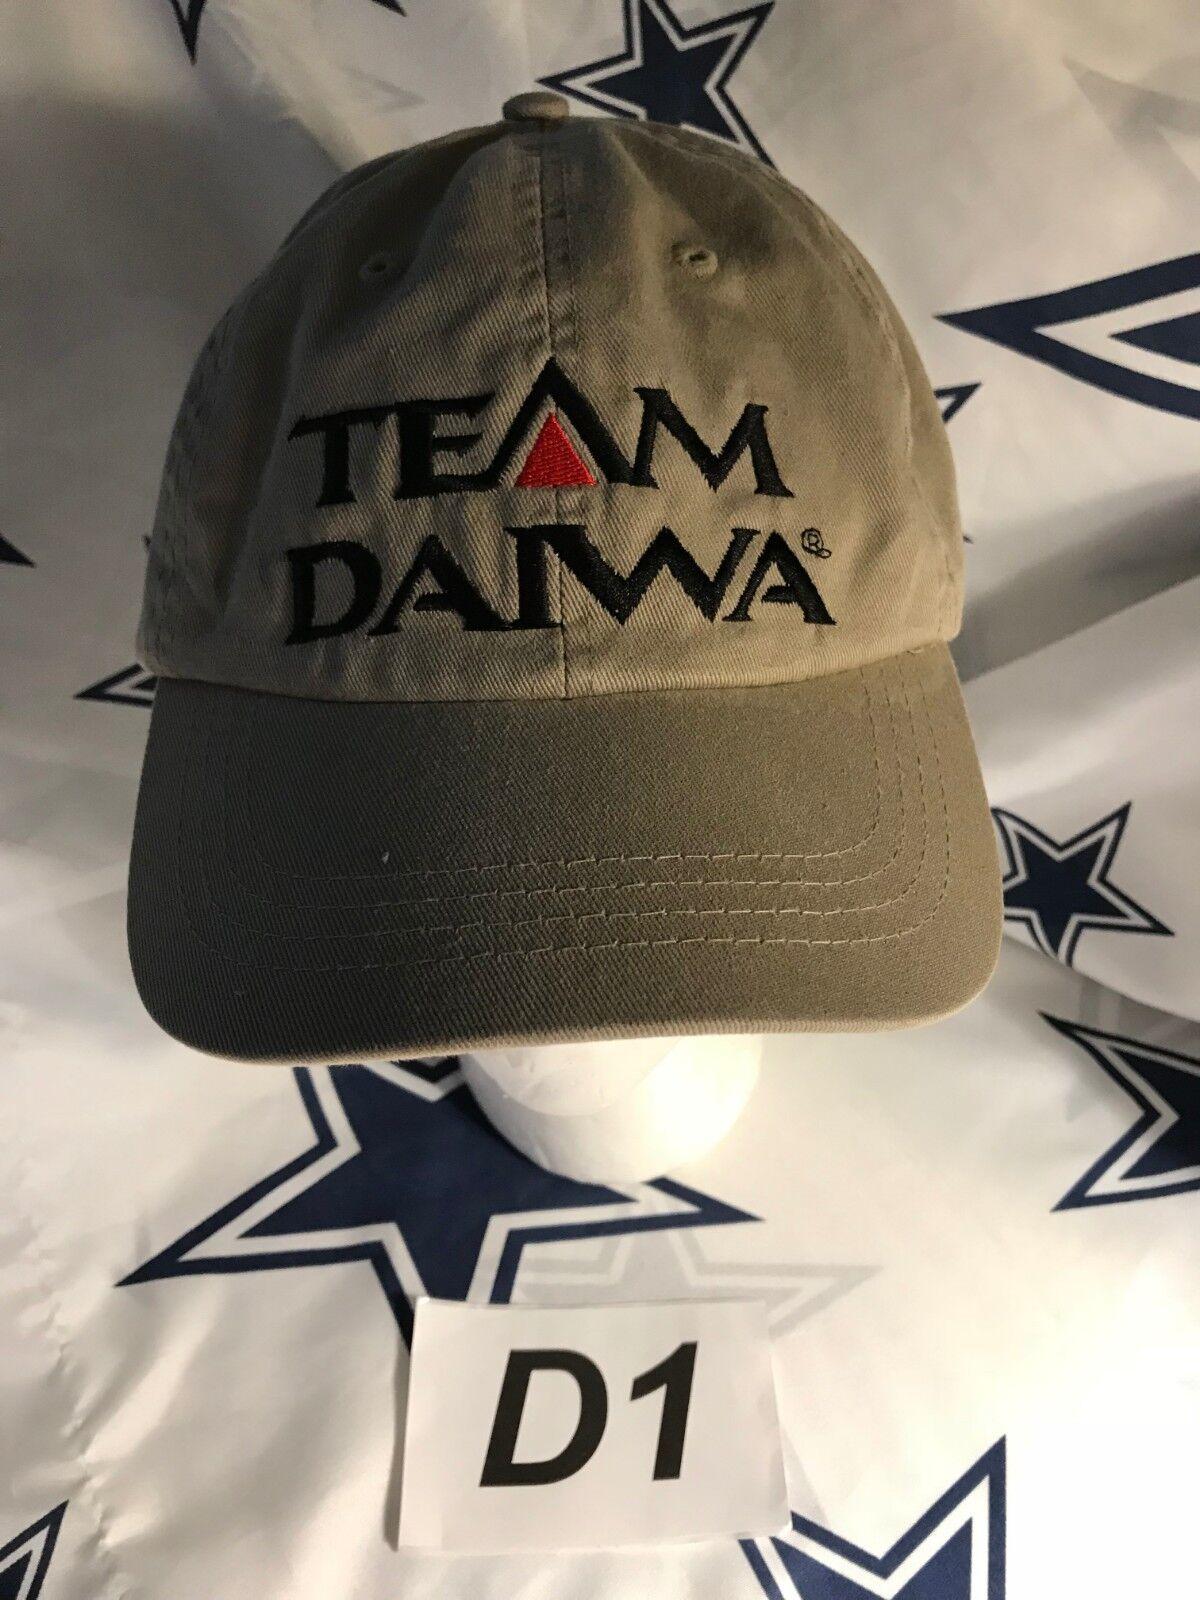 a60b0a83723 ... denmark vintage vtg team daiwa tan hat adjustable fishing baseball cap  90 adjustable hat strap usad1